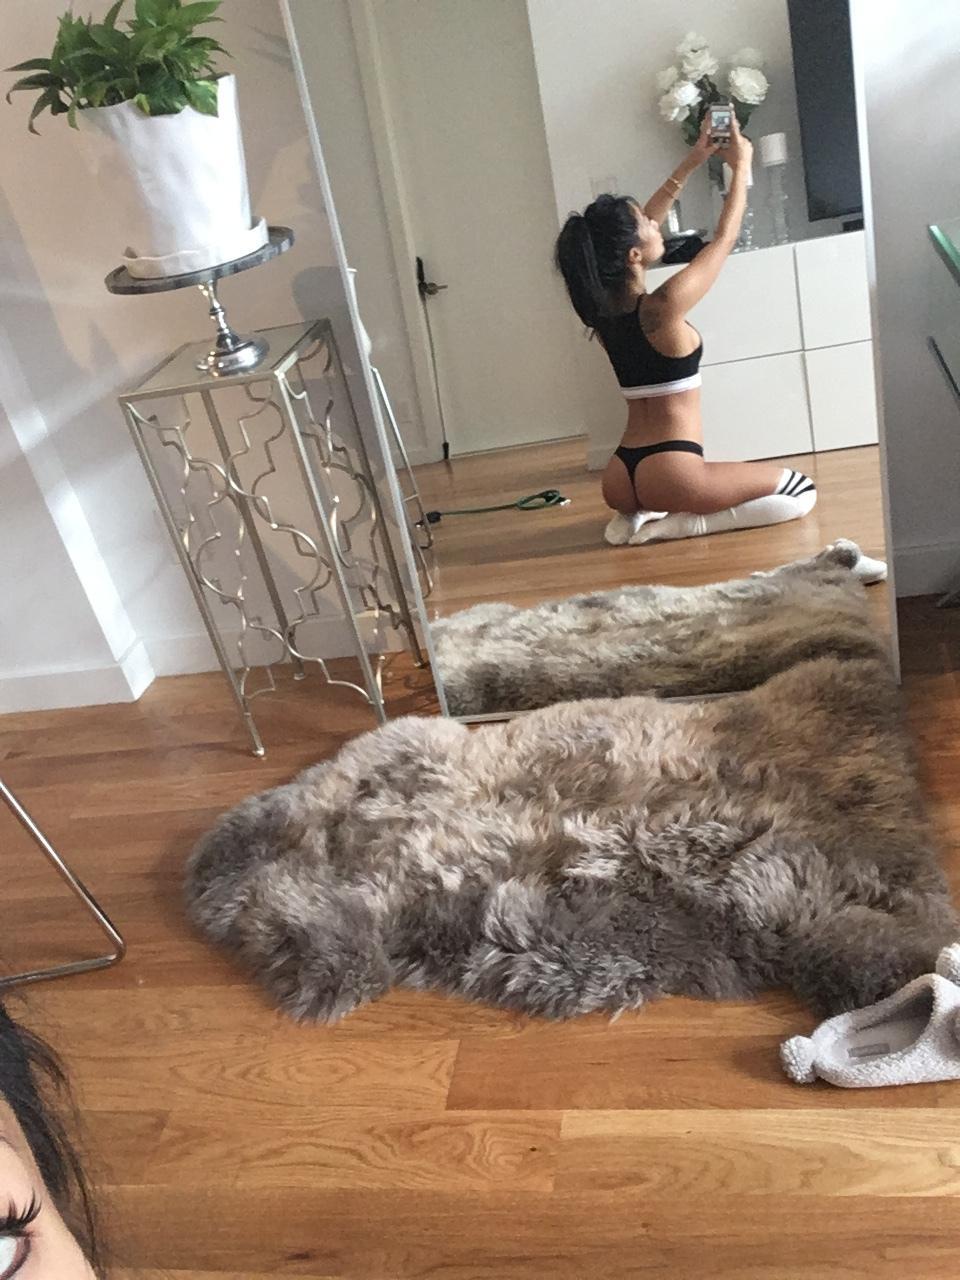 Asa Akira Nude Mirror Selfie Onlyfans Set Leaked Frtino